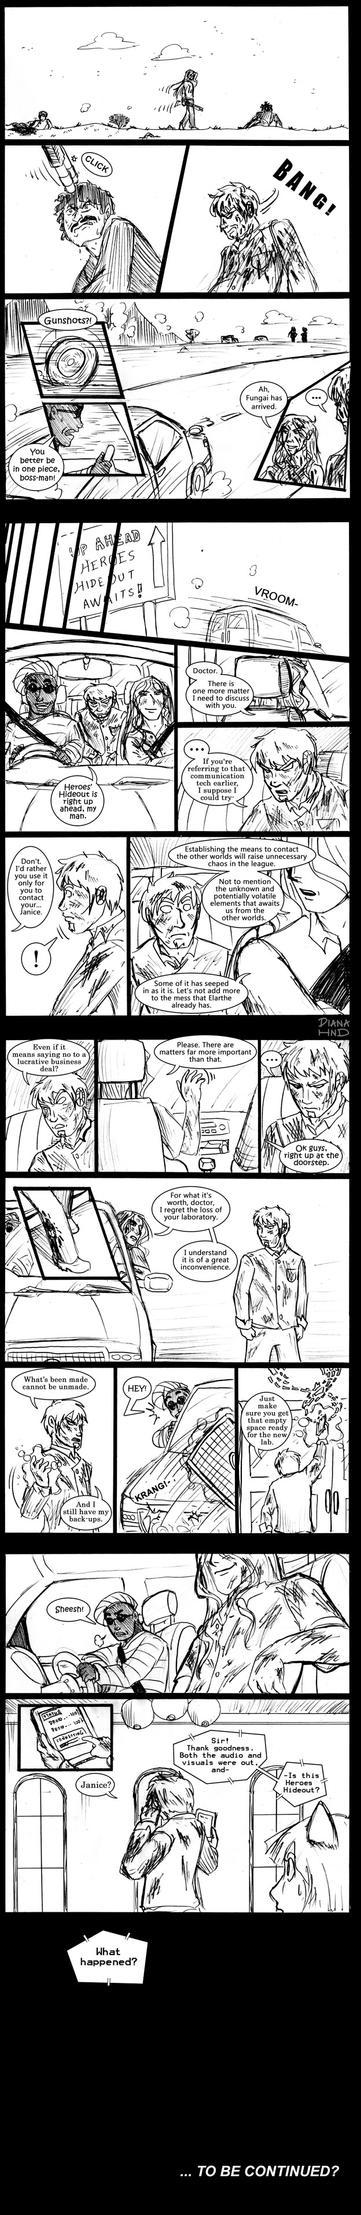 EA-LEC: Dorian vs Jack Photon - Part 6 (Last) by diana-hnd